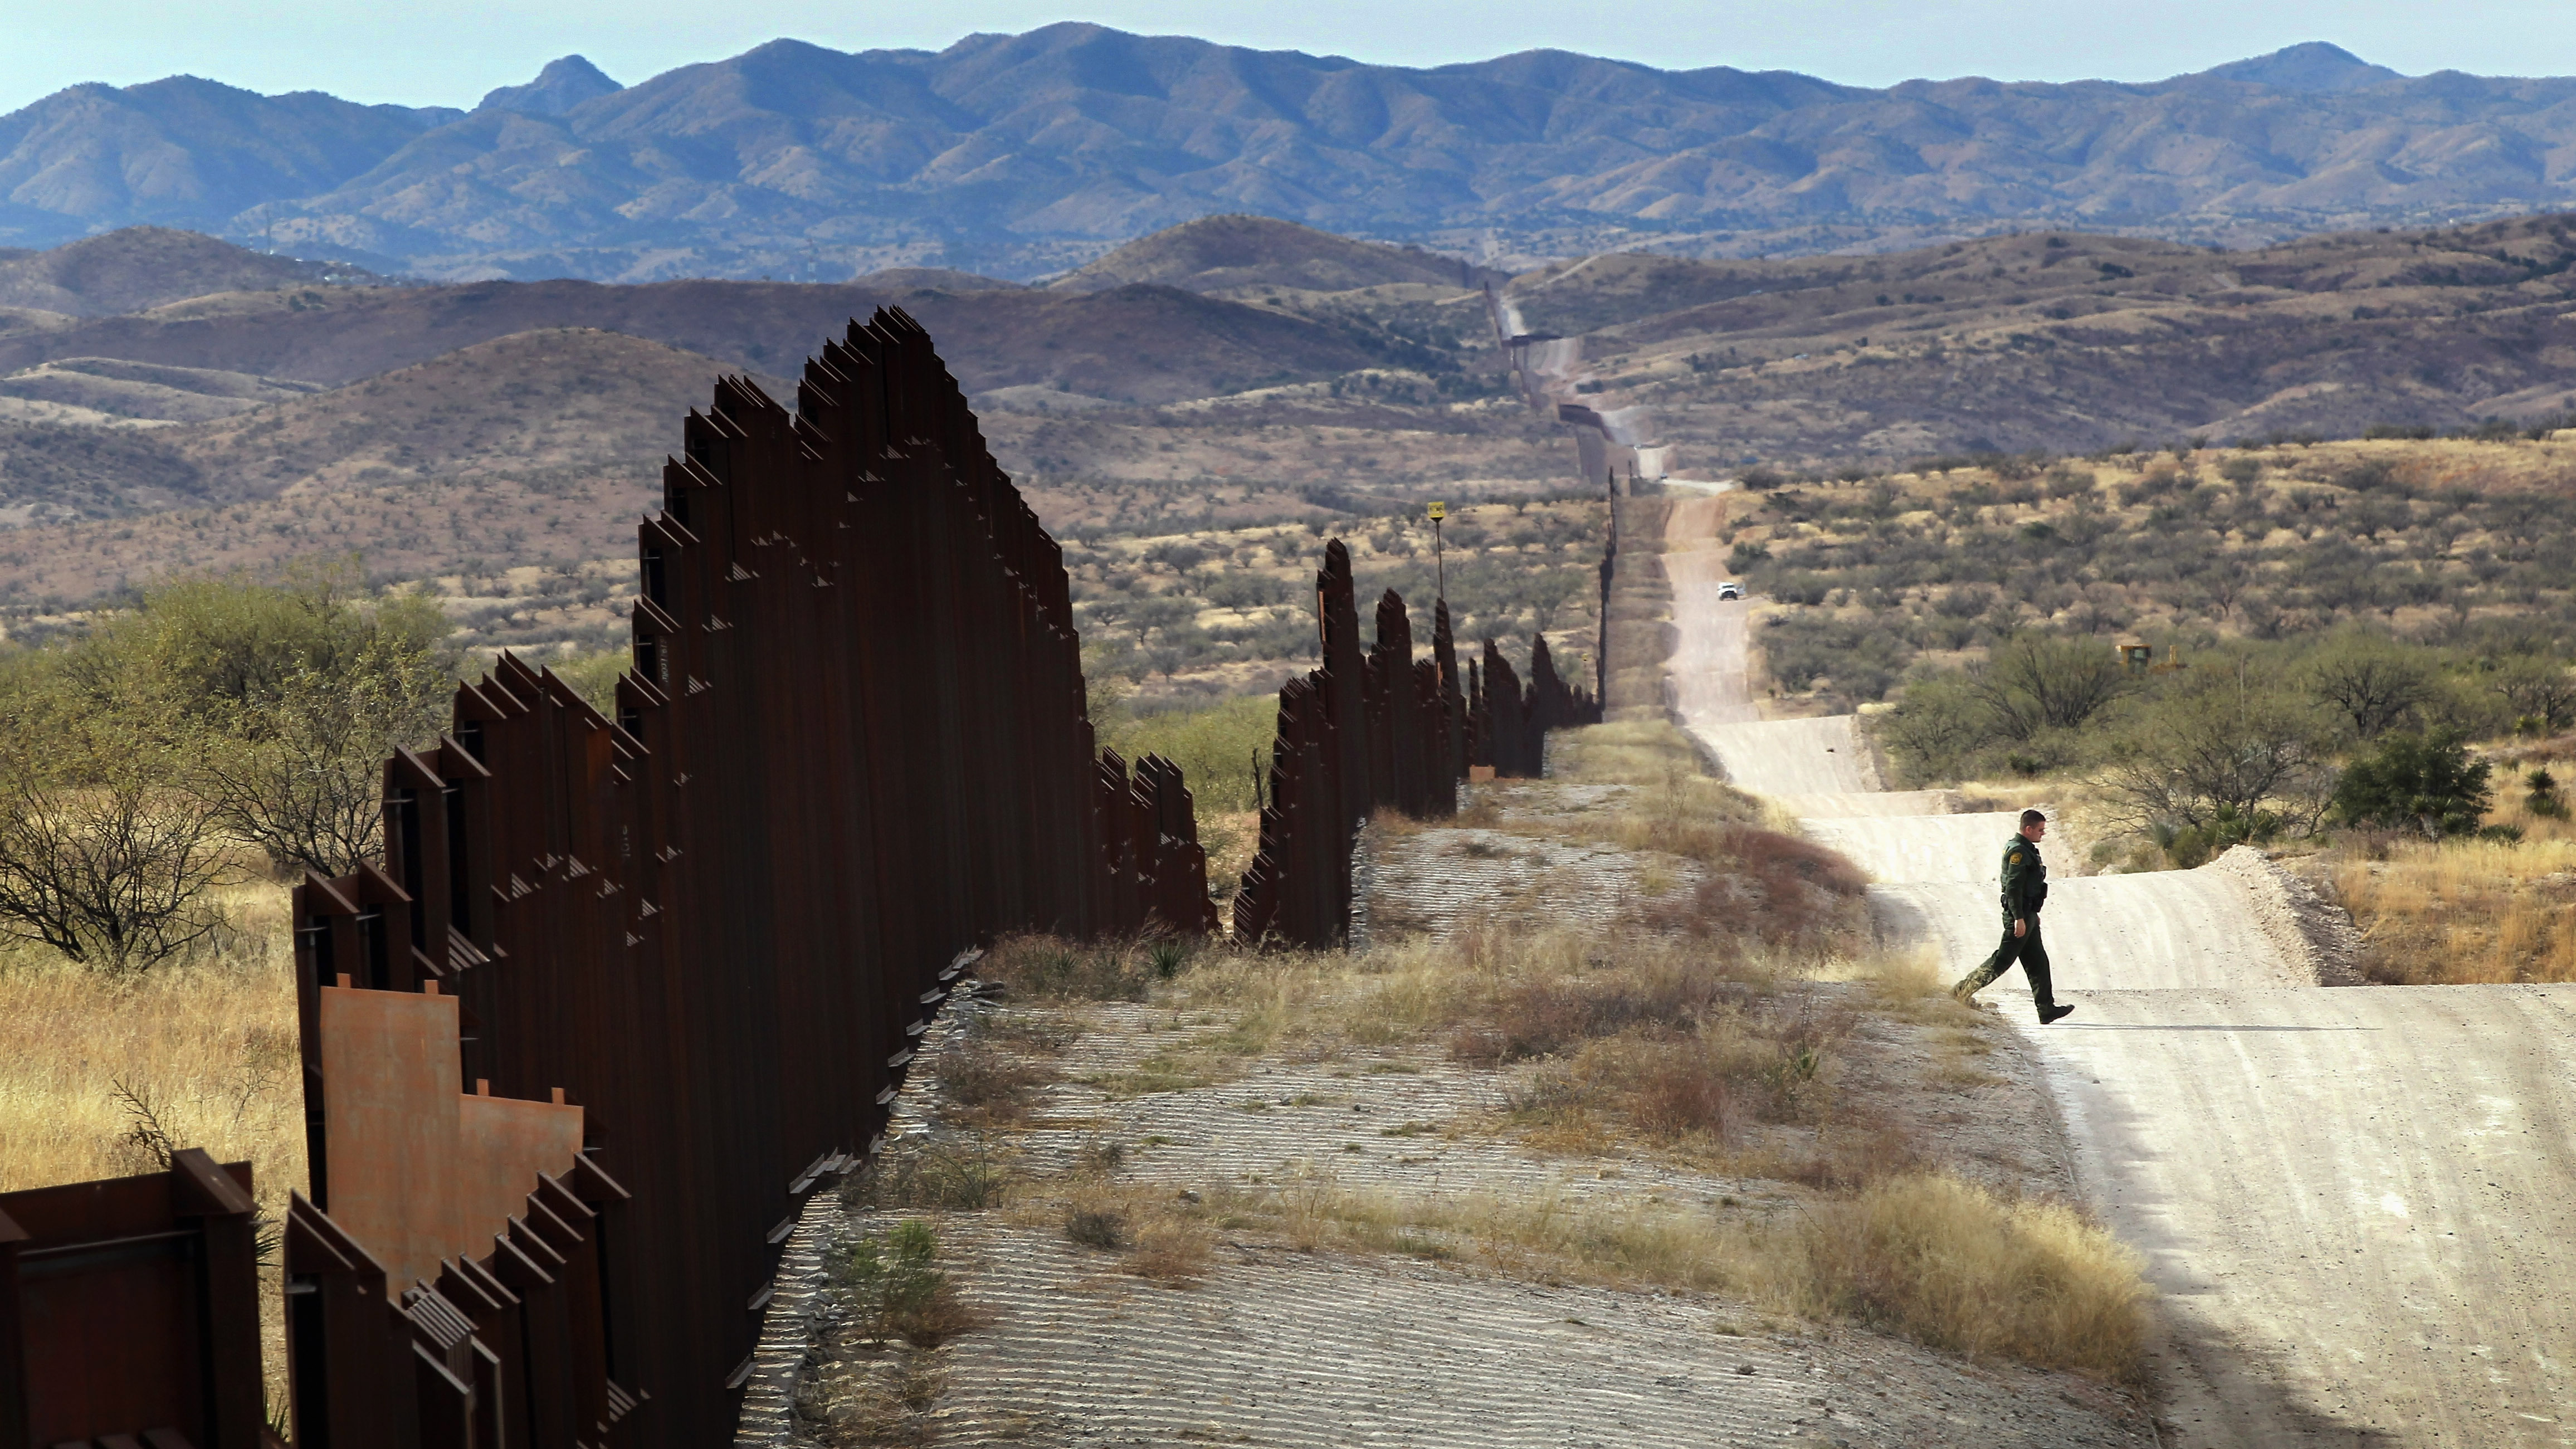 Dozens Of Countries Take In More Immigrants Per Capita Than The U.S.